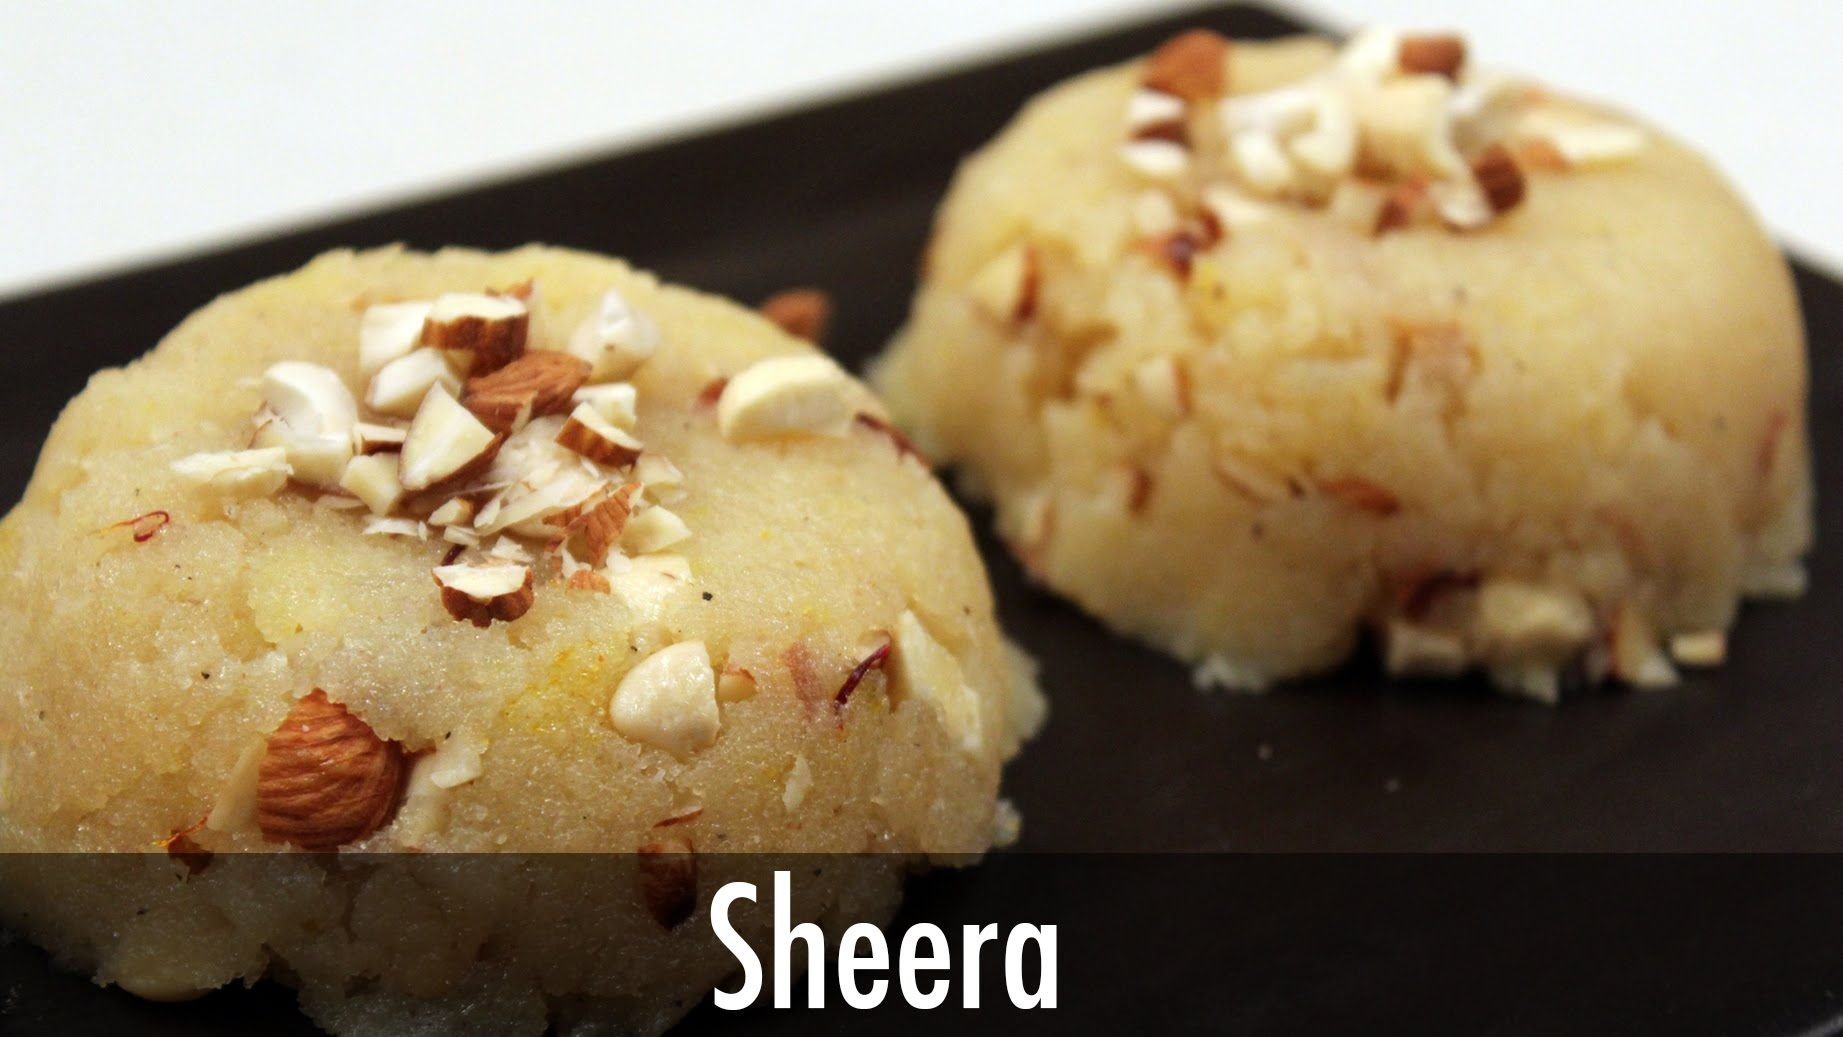 Sheera sweet dish recipe sanjeev kapoor khazana sanjeev kapoor sheera sweet dish recipe sanjeev kapoor khazana forumfinder Gallery